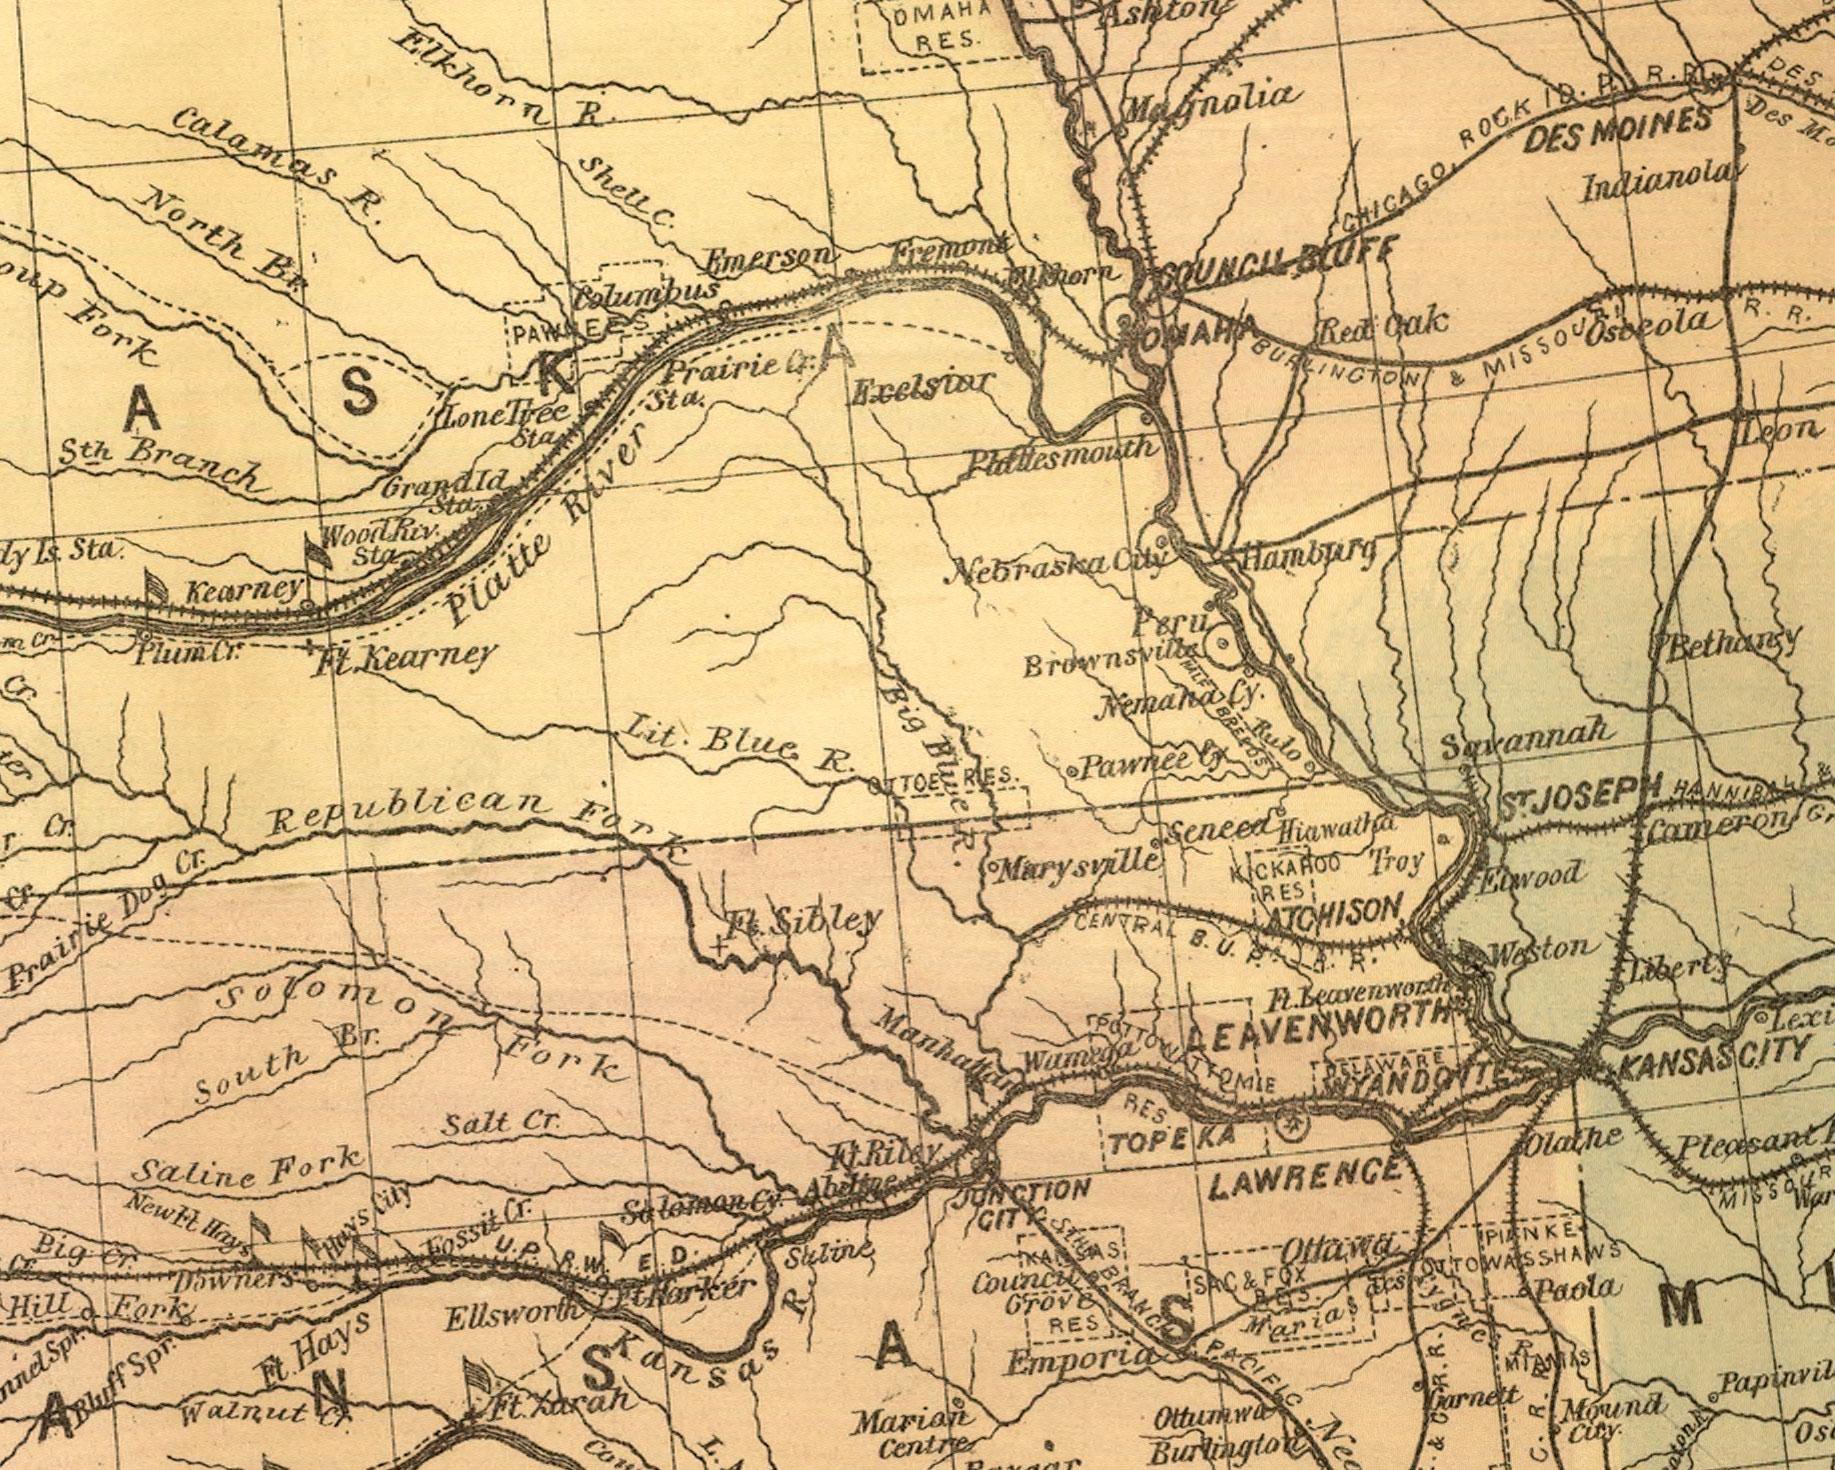 Central nch Union Pacific Railroad - Wikipedia on bnsf map kansas, western railroad map kansas, amtrak map kansas, union pacific track map, union pacific road map, union pacific route map, rock island railroad map kansas, union pacific map in indiana, railroad track map kansas, union pacific routes in kansas, union pacific rr map, map of southern kansas, union pacific rail map texas,